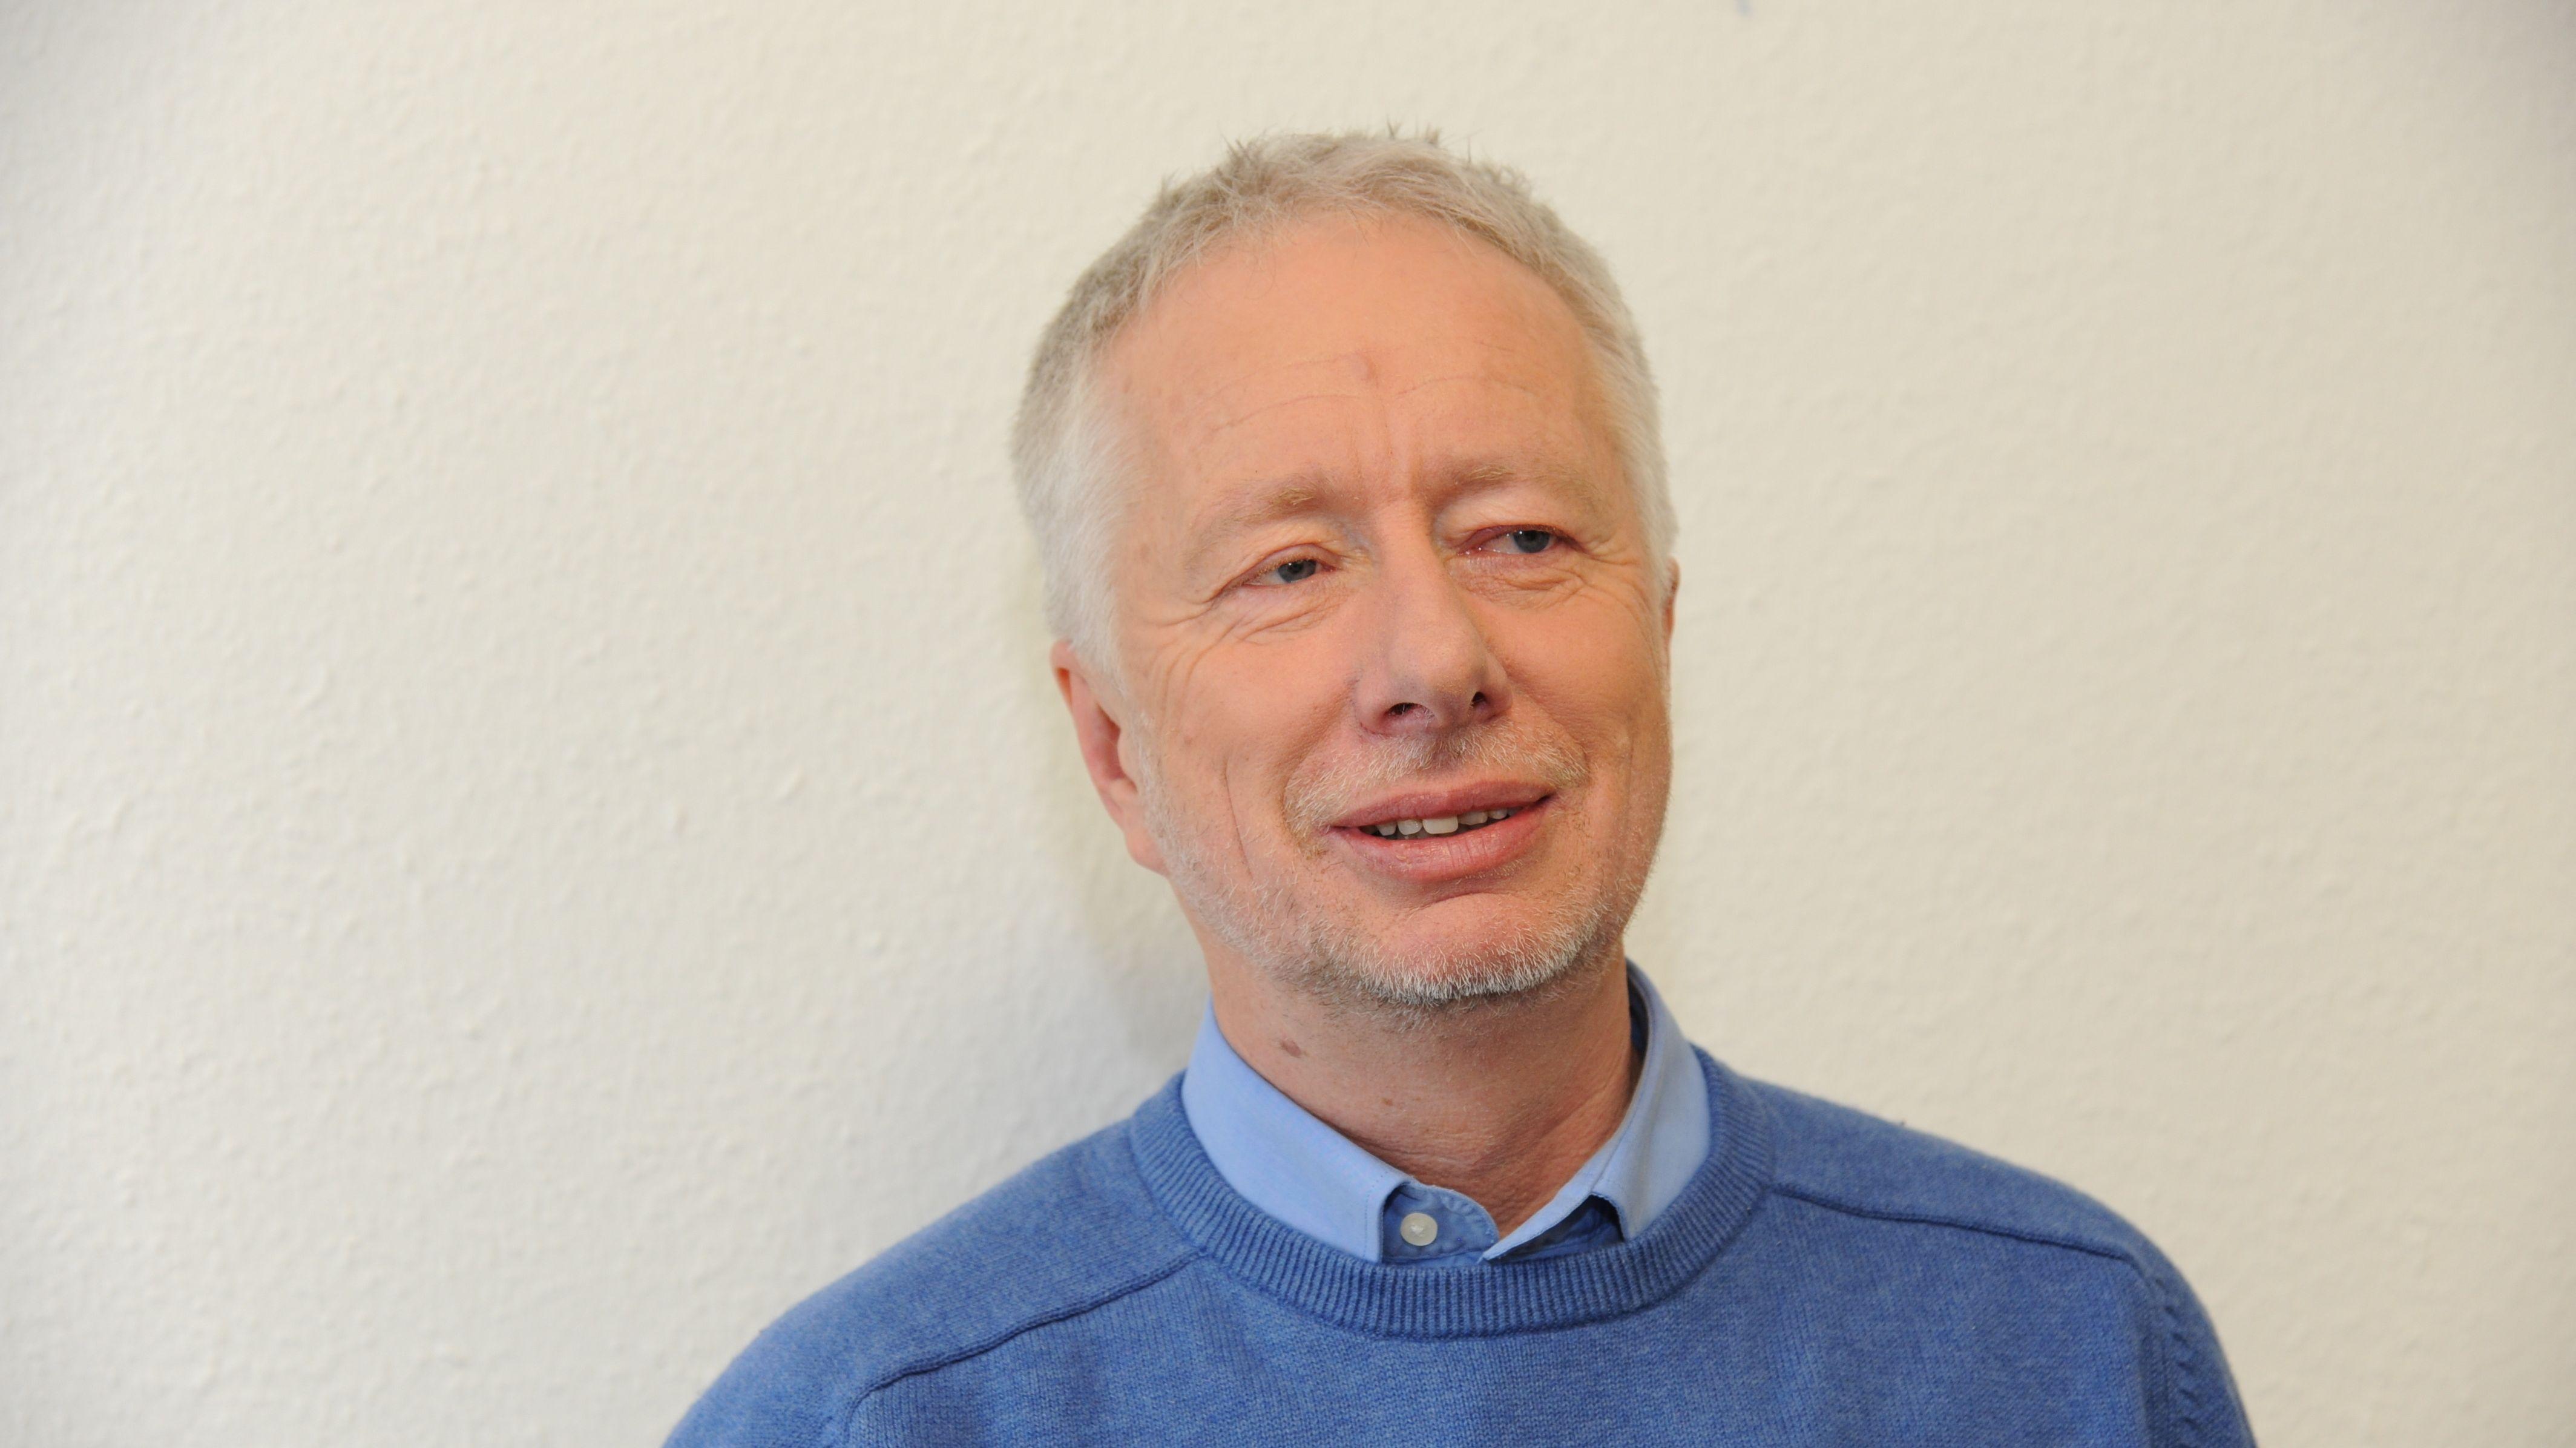 Pflegeexperte Claus Fussek